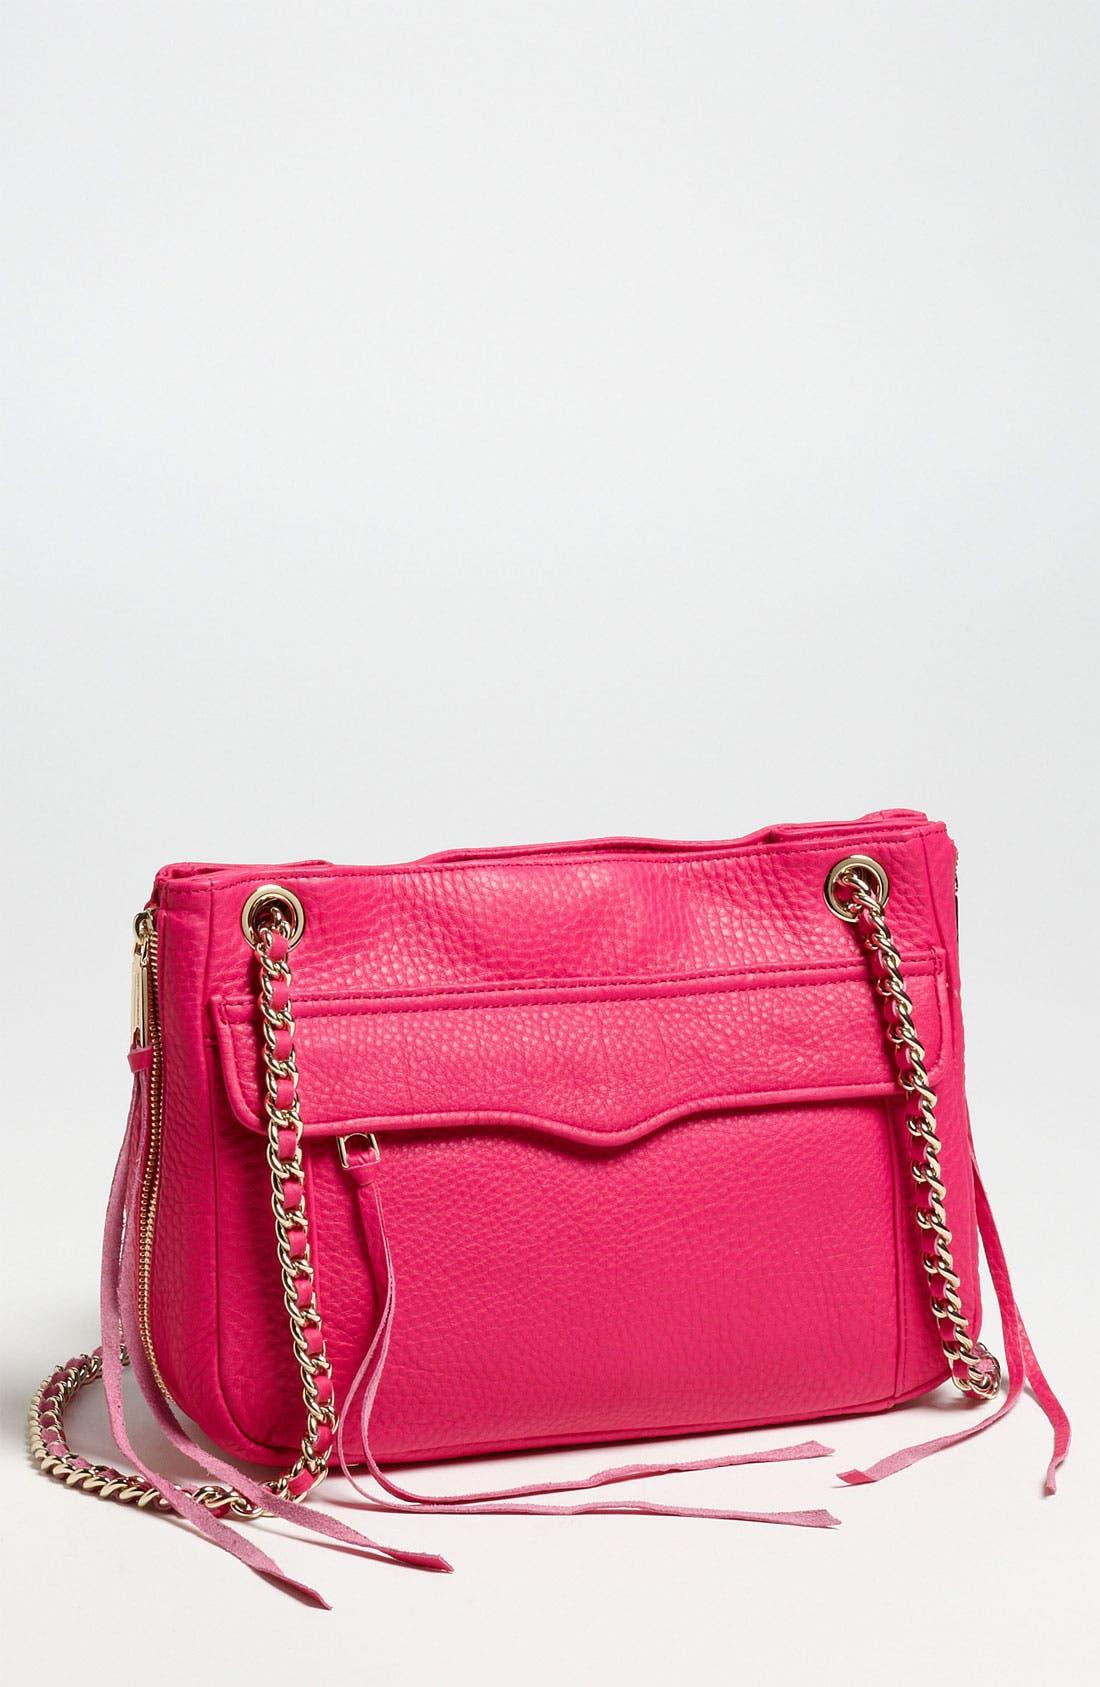 Main Image - Rebecca Minkoff 'Swing' Convertible Shoulder Bag